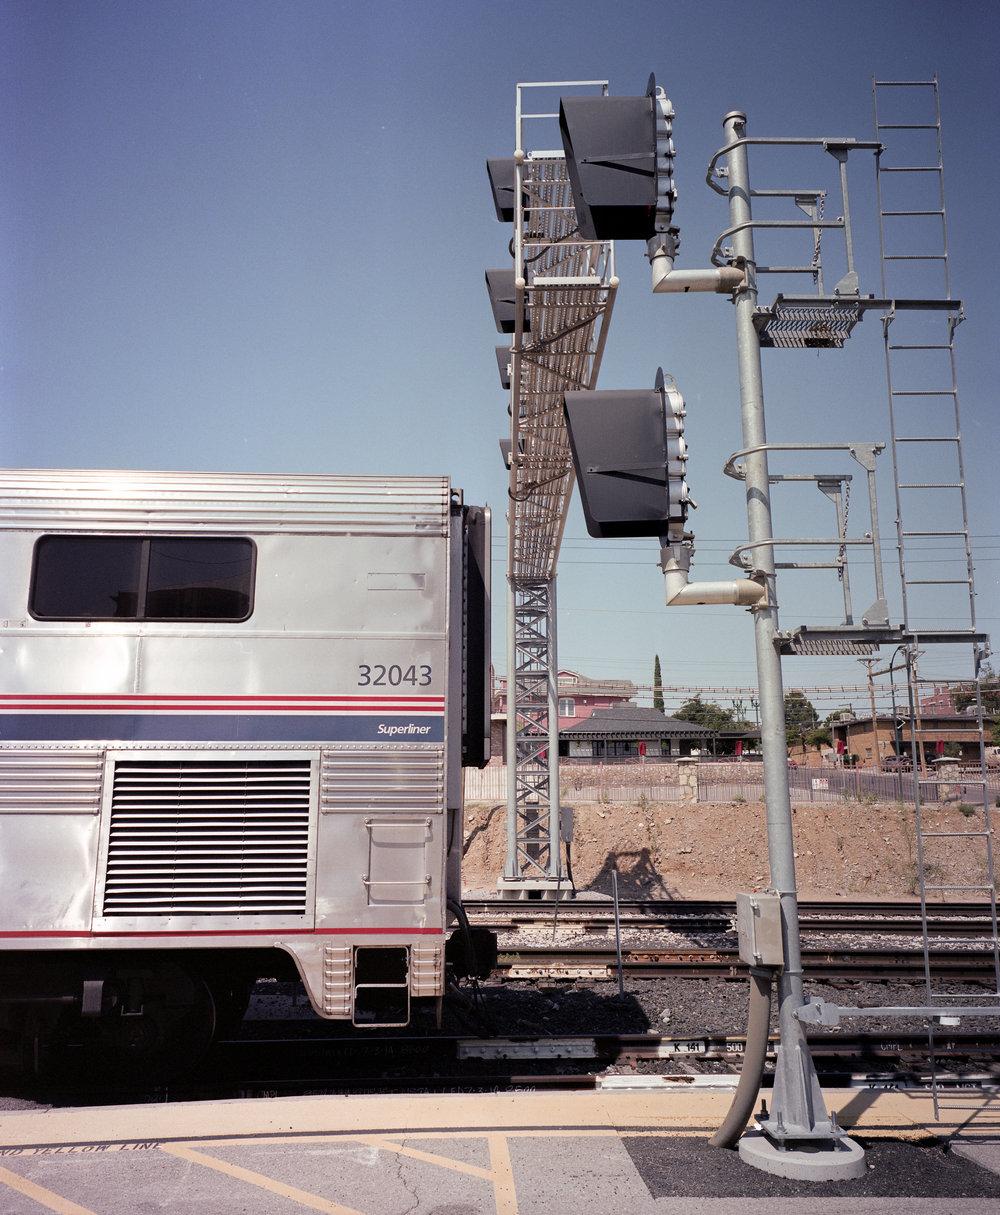 El Paso Fuji GF670w | Kodak Portra 400